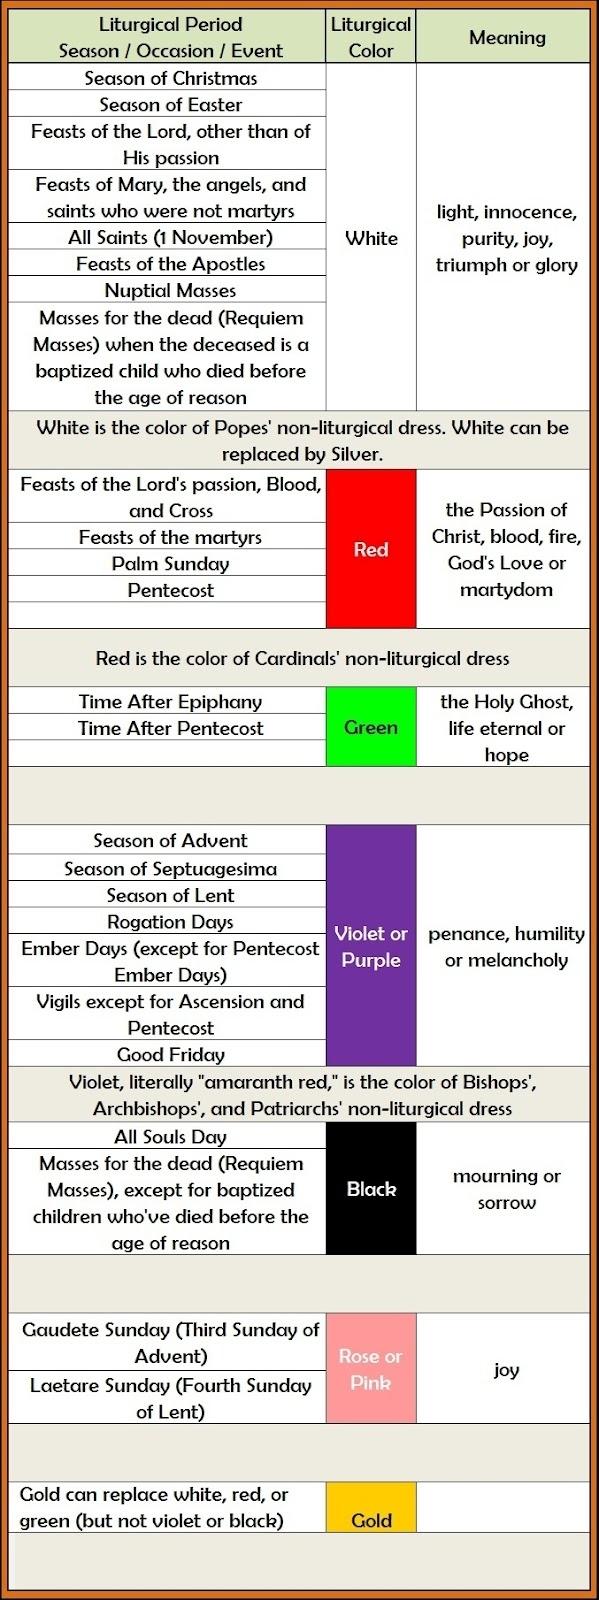 St. Luke Catholic Church: Liturgical Calendar with How Many Days In Liturgical Calendar Compared To Regular Calendar